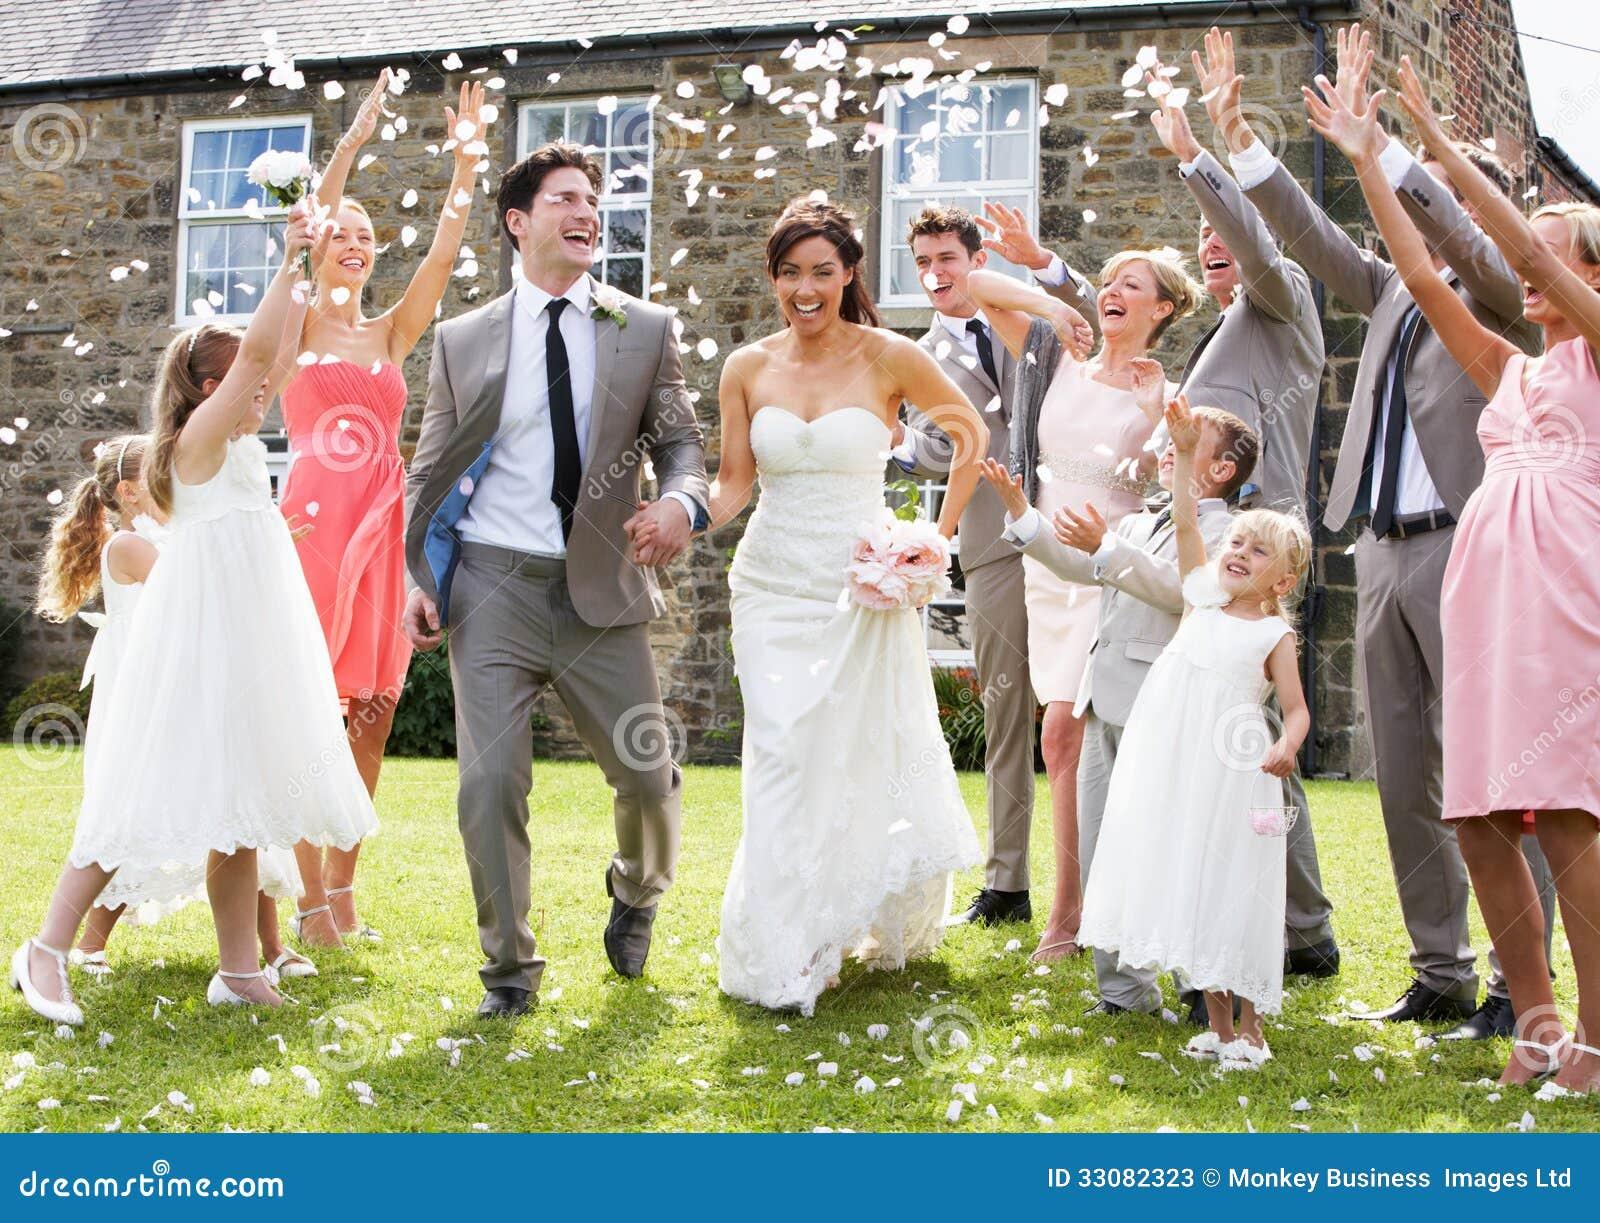 Convidados que jogam confetes sobre noivos